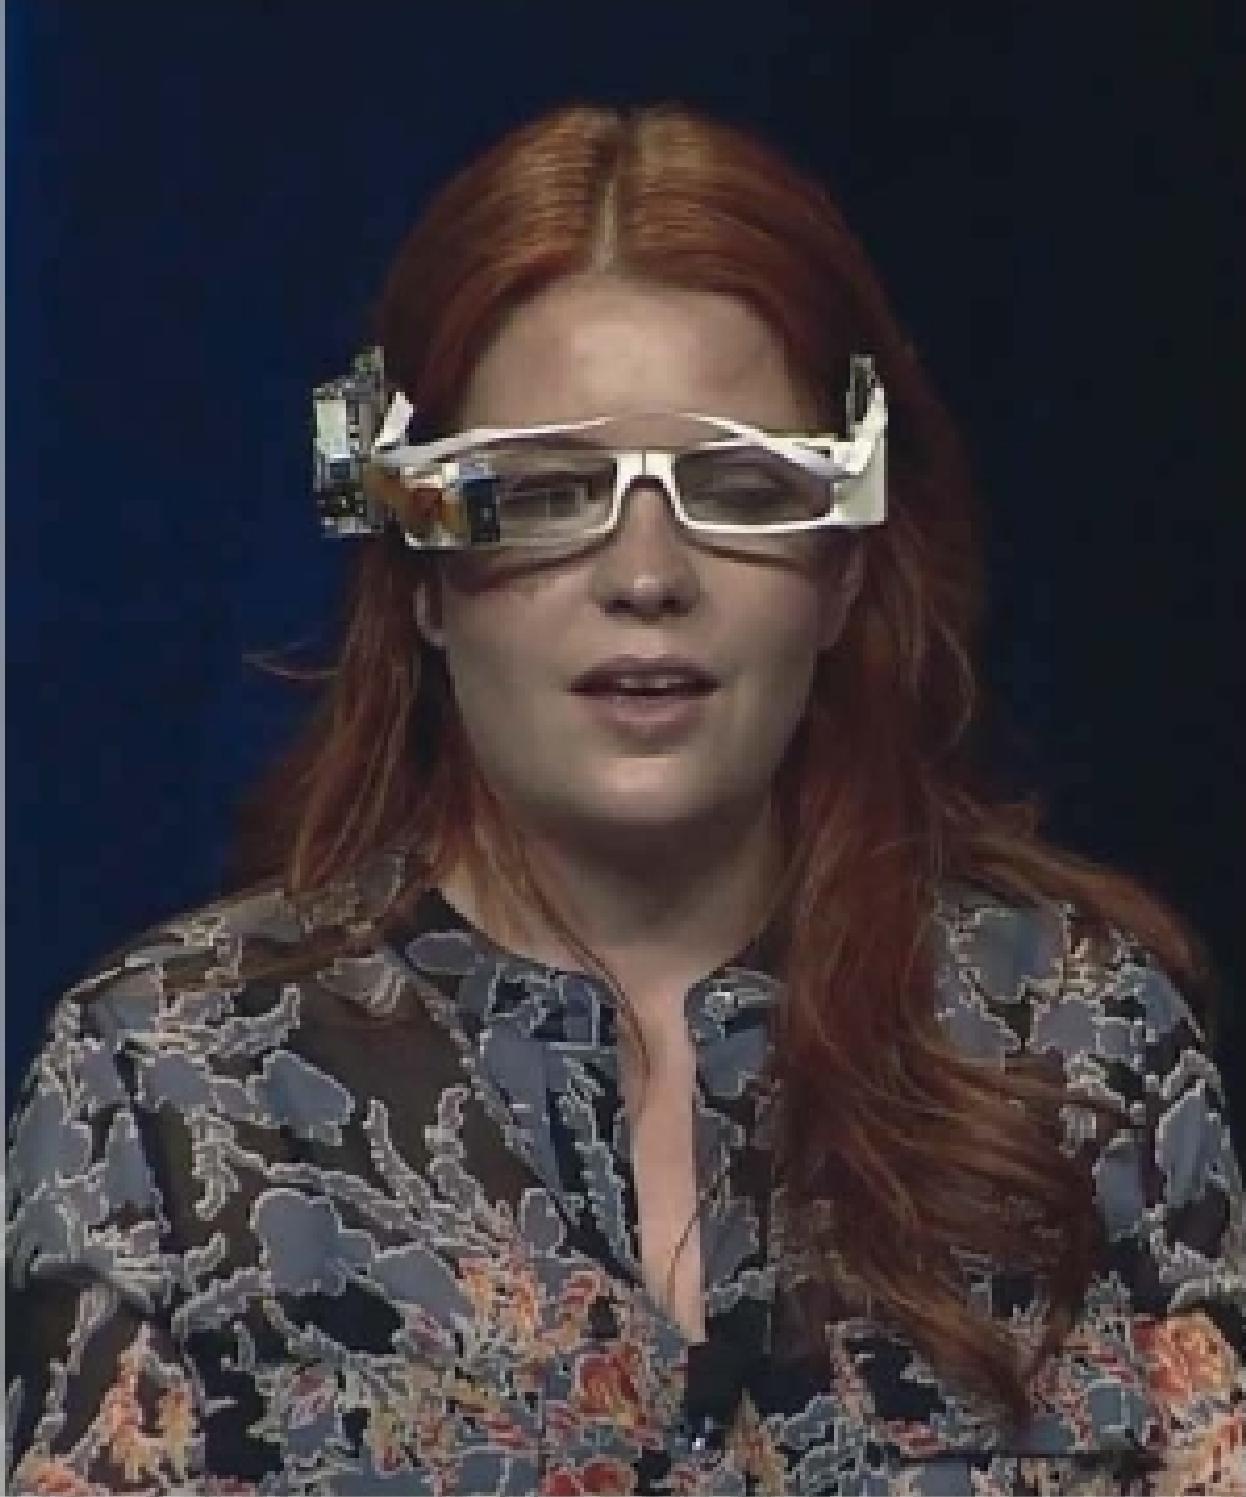 http://pc-urgence.com/actus/wp-content/uploads/2013/google-glass/googleglass_Picture6.jpg